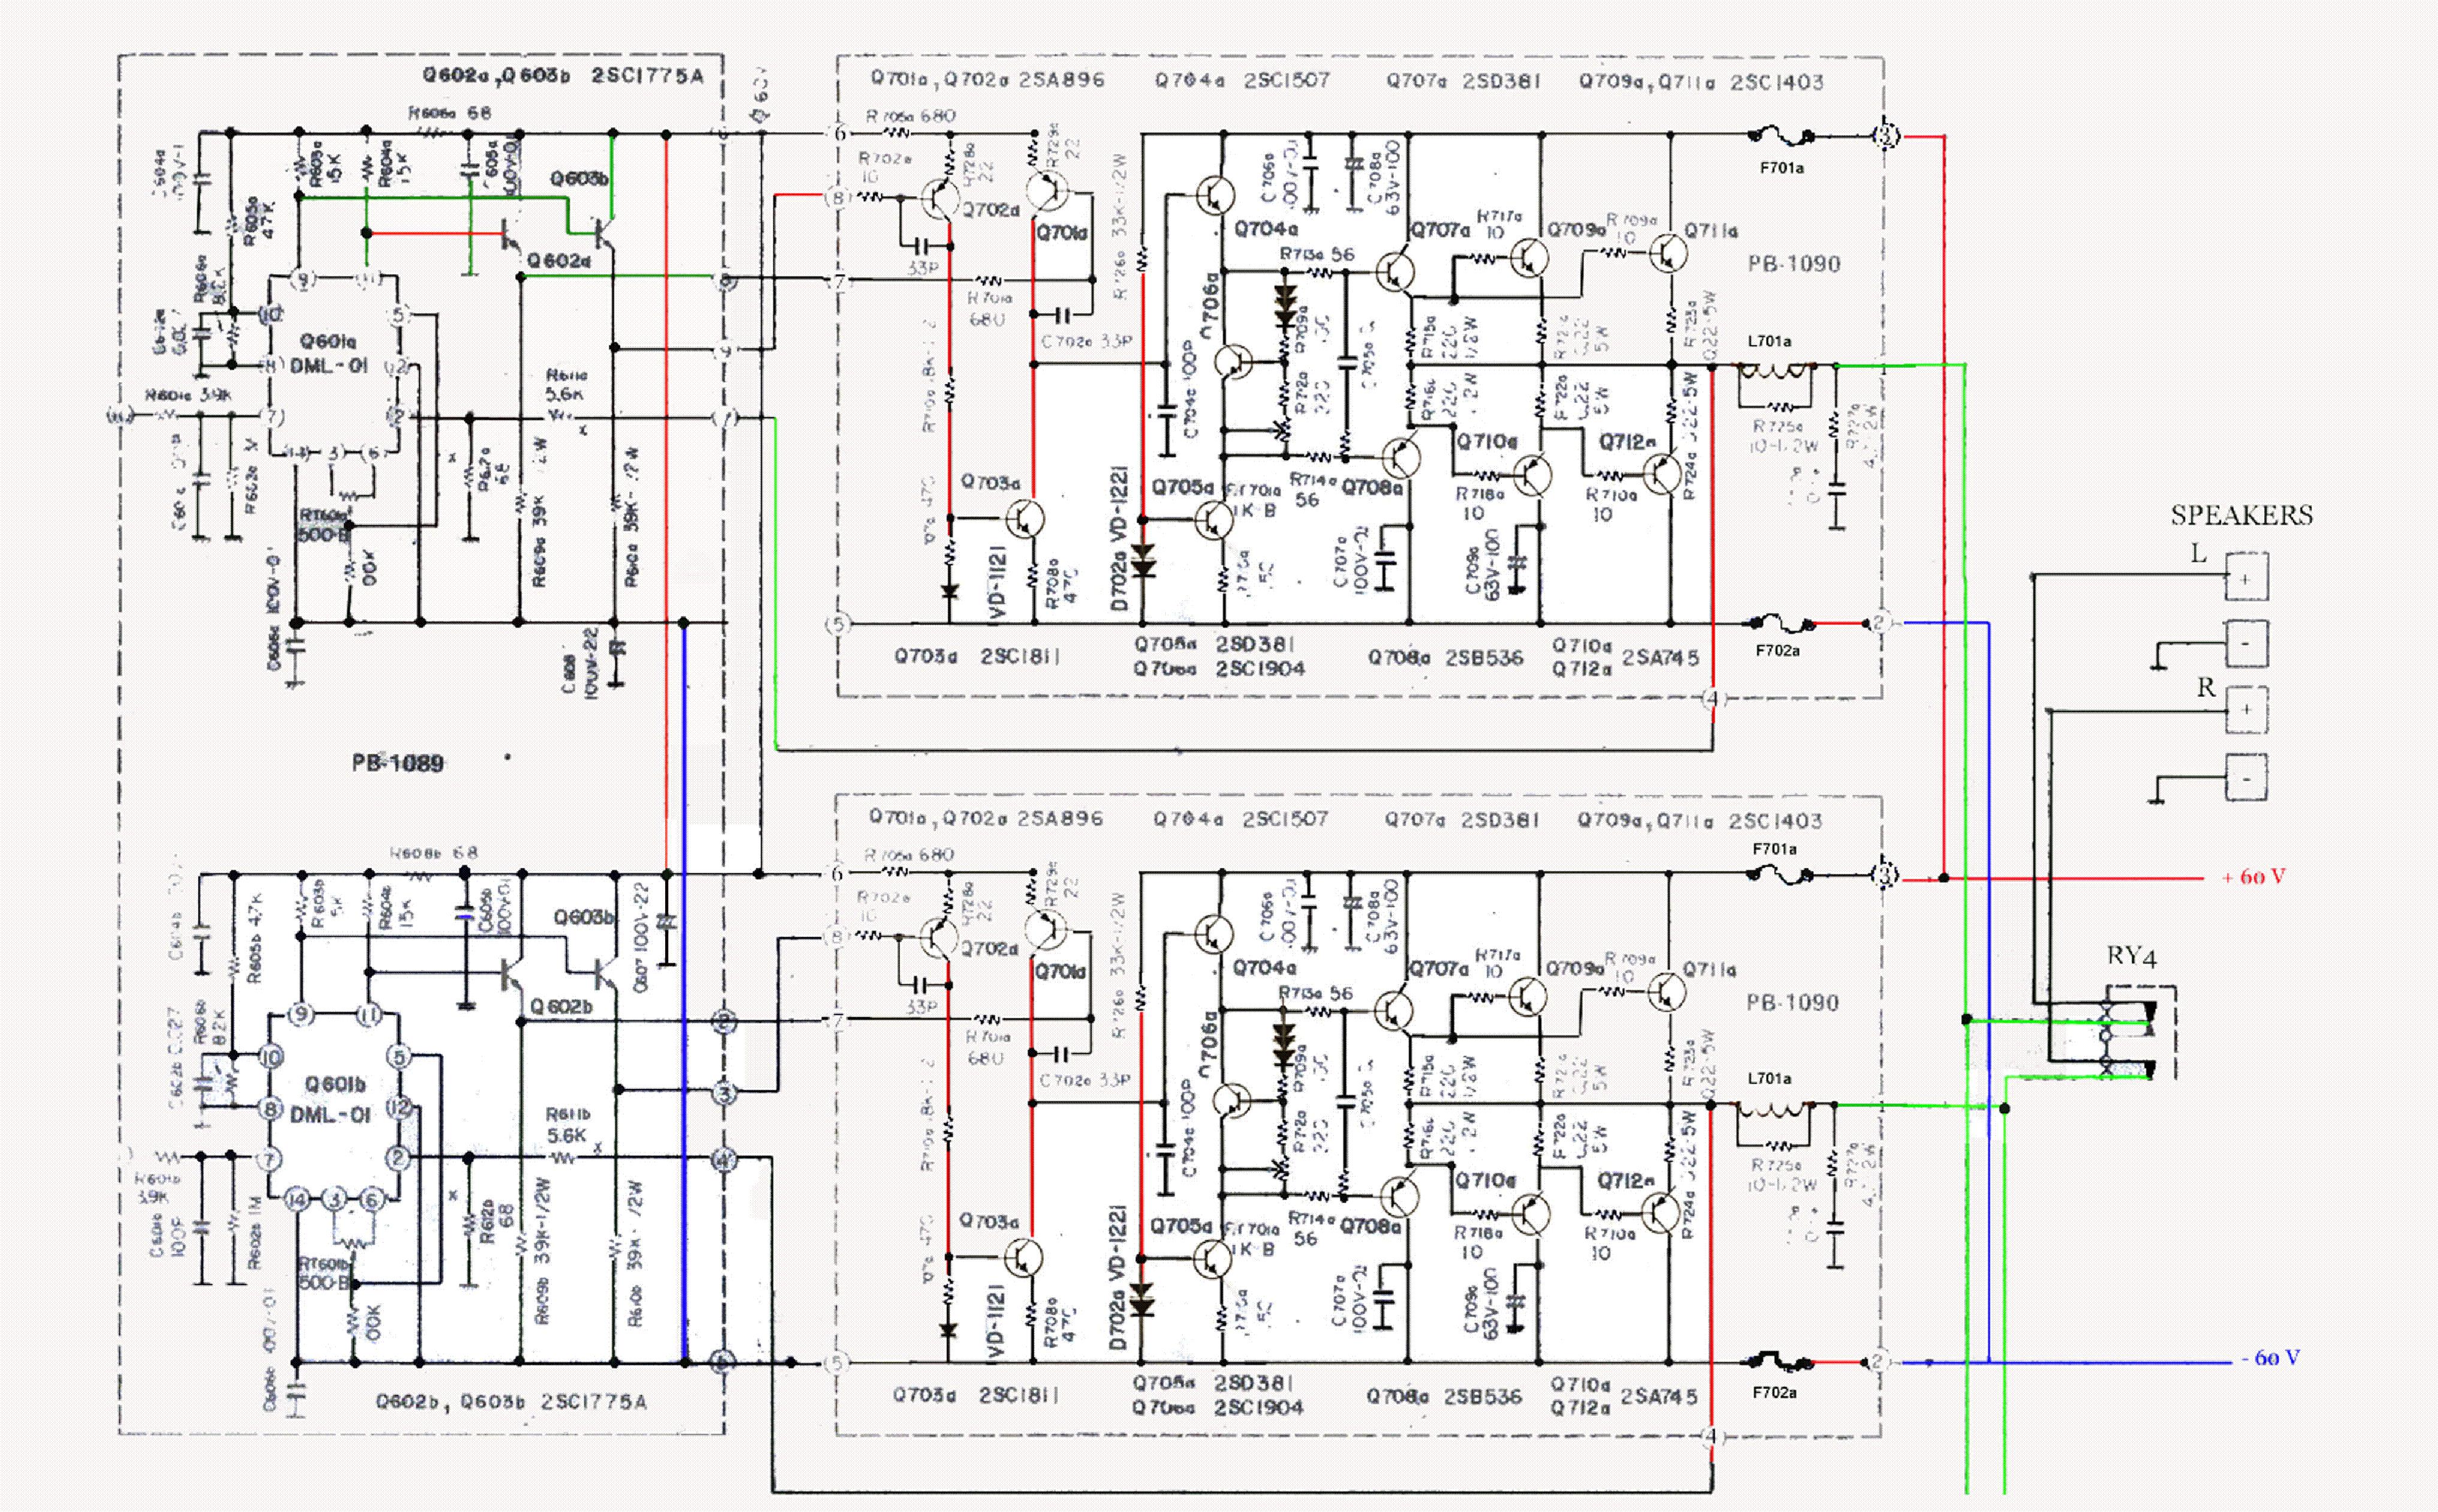 vk_9939] 22 pa wiring wiring diagram  semec.brand.innterest.info